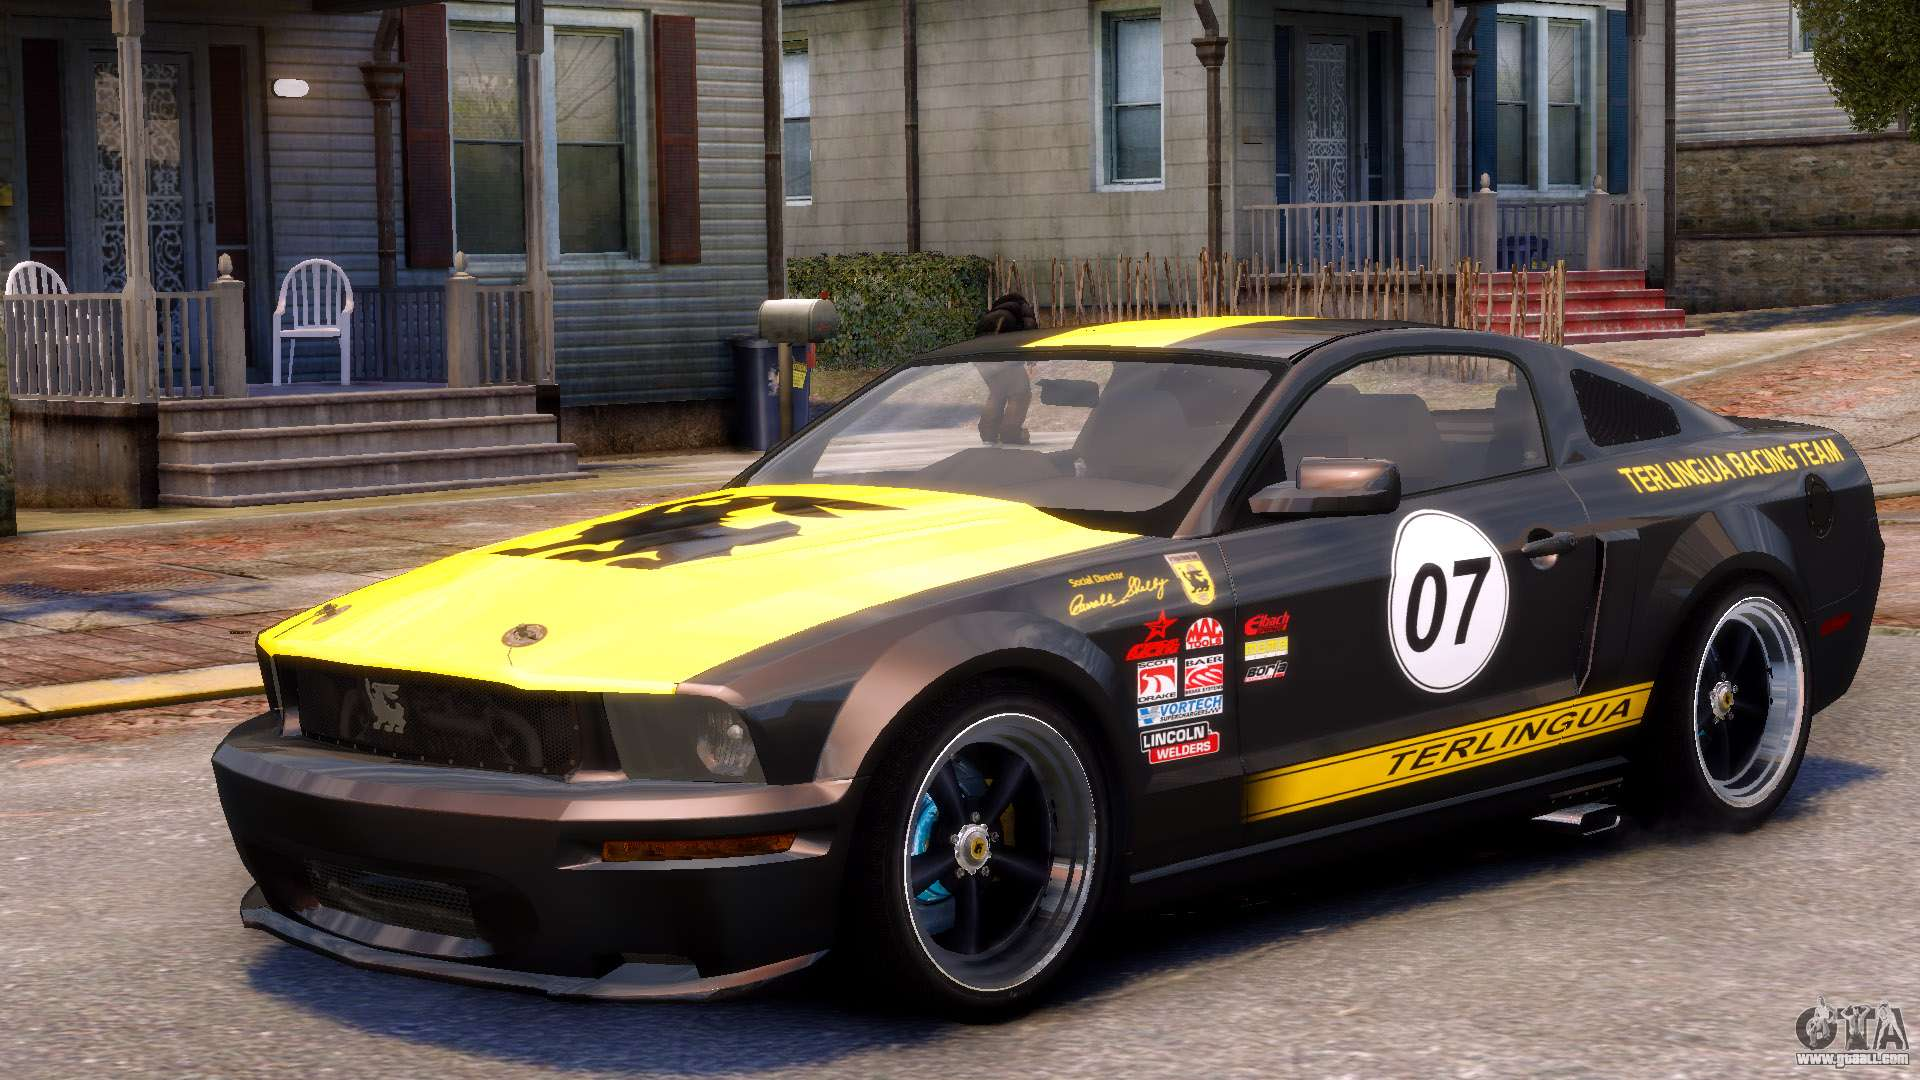 Shelby Terlingua Mustang For Gta 4